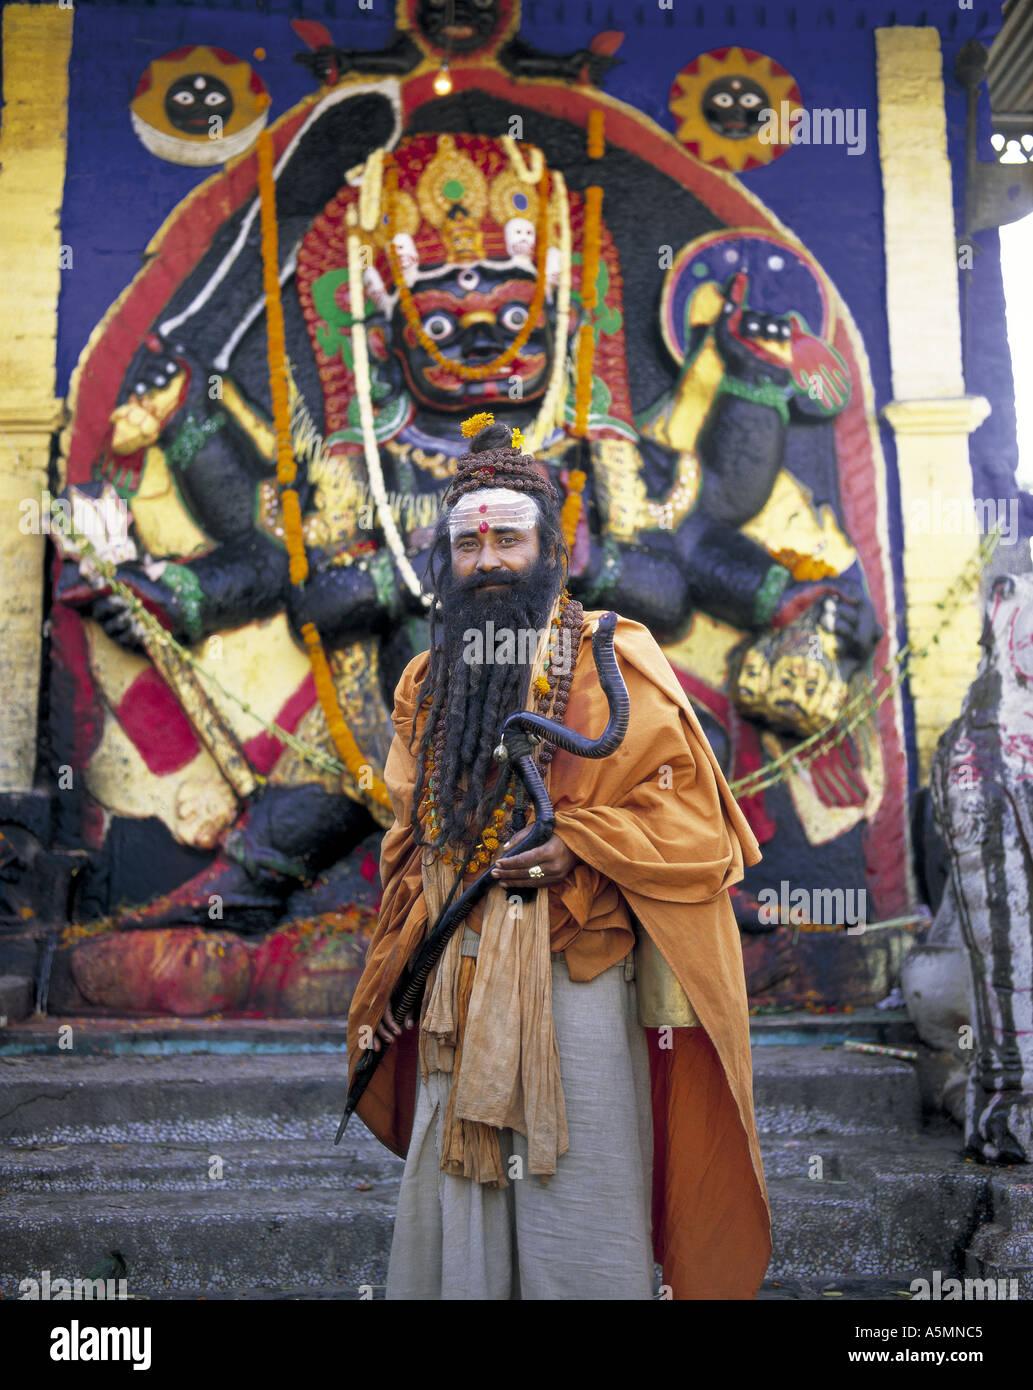 Sadhu standing in front of Goddess Kali statue Katmandu Nepal - Stock Image